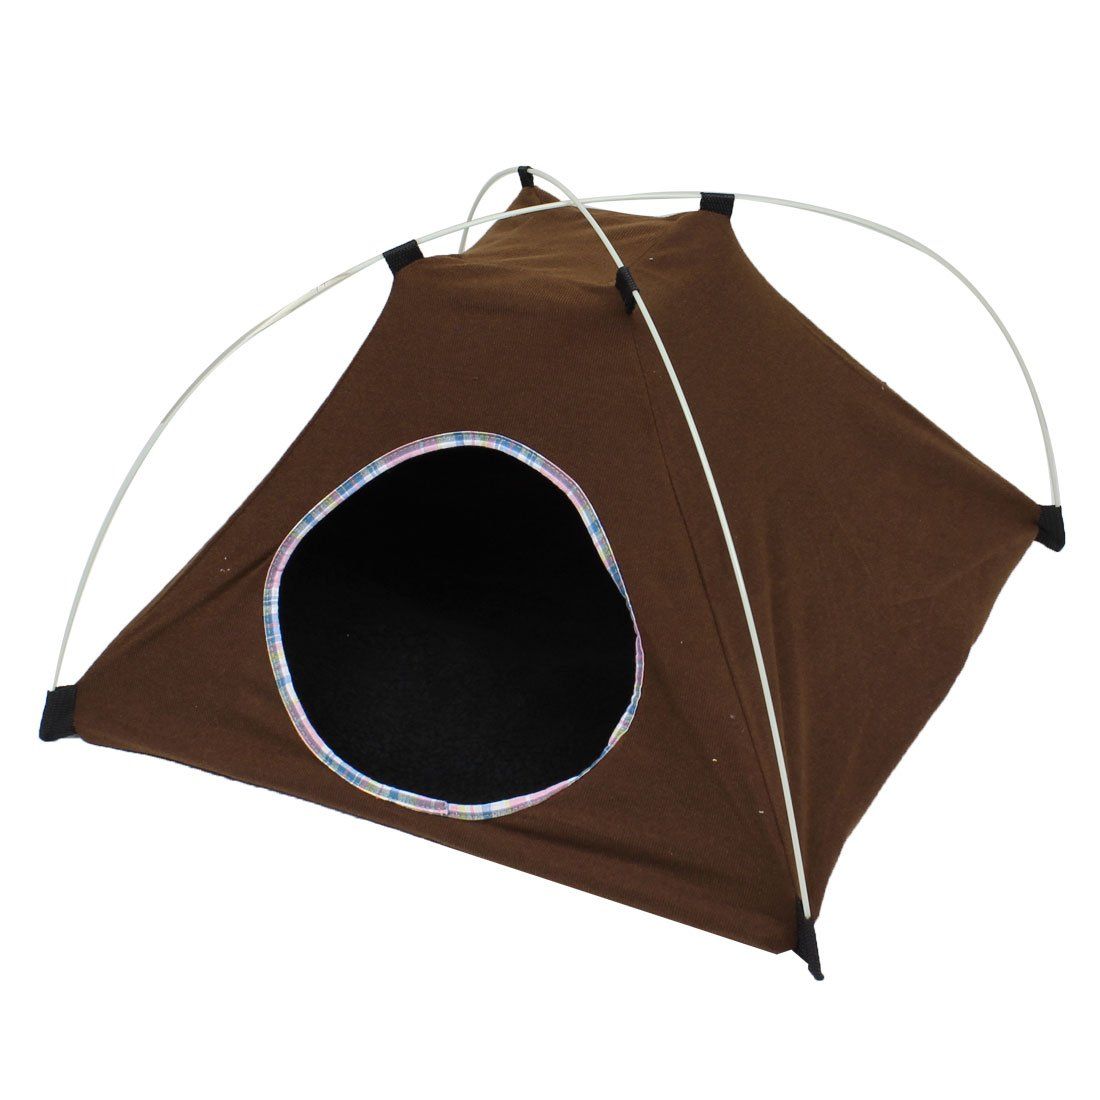 Jardin Pet Foldable Tent, 22cm, Coffee by Jardin (Image #1)